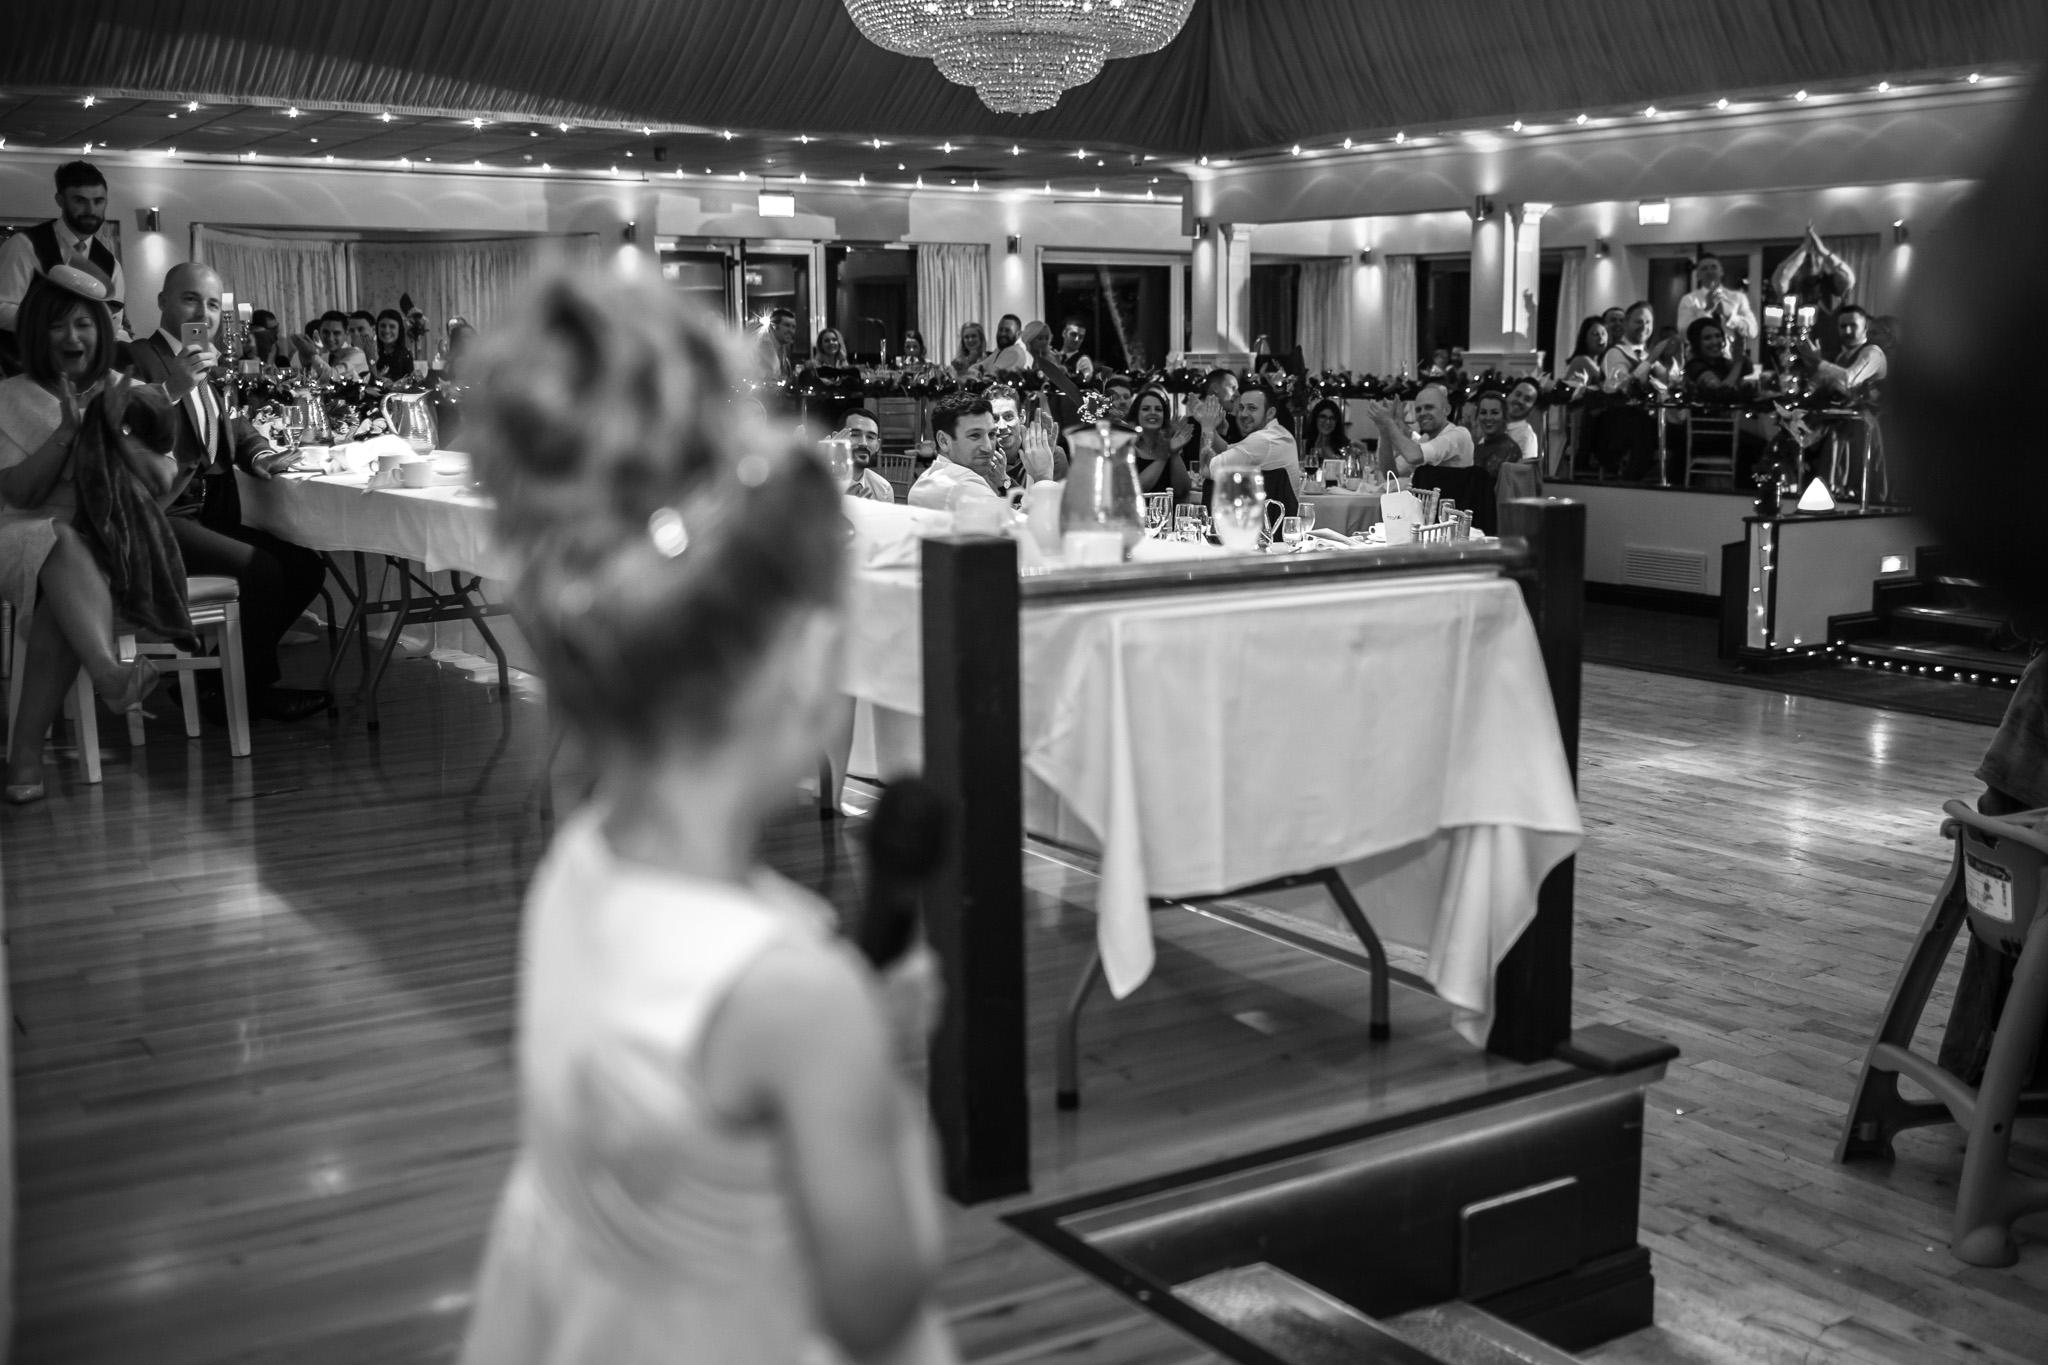 Mark_Barnes_Northern_Ireland_wedding_photographer_Harveys_Point_Donegall_Wedding_photography-Adam&Gemma-60.jpg